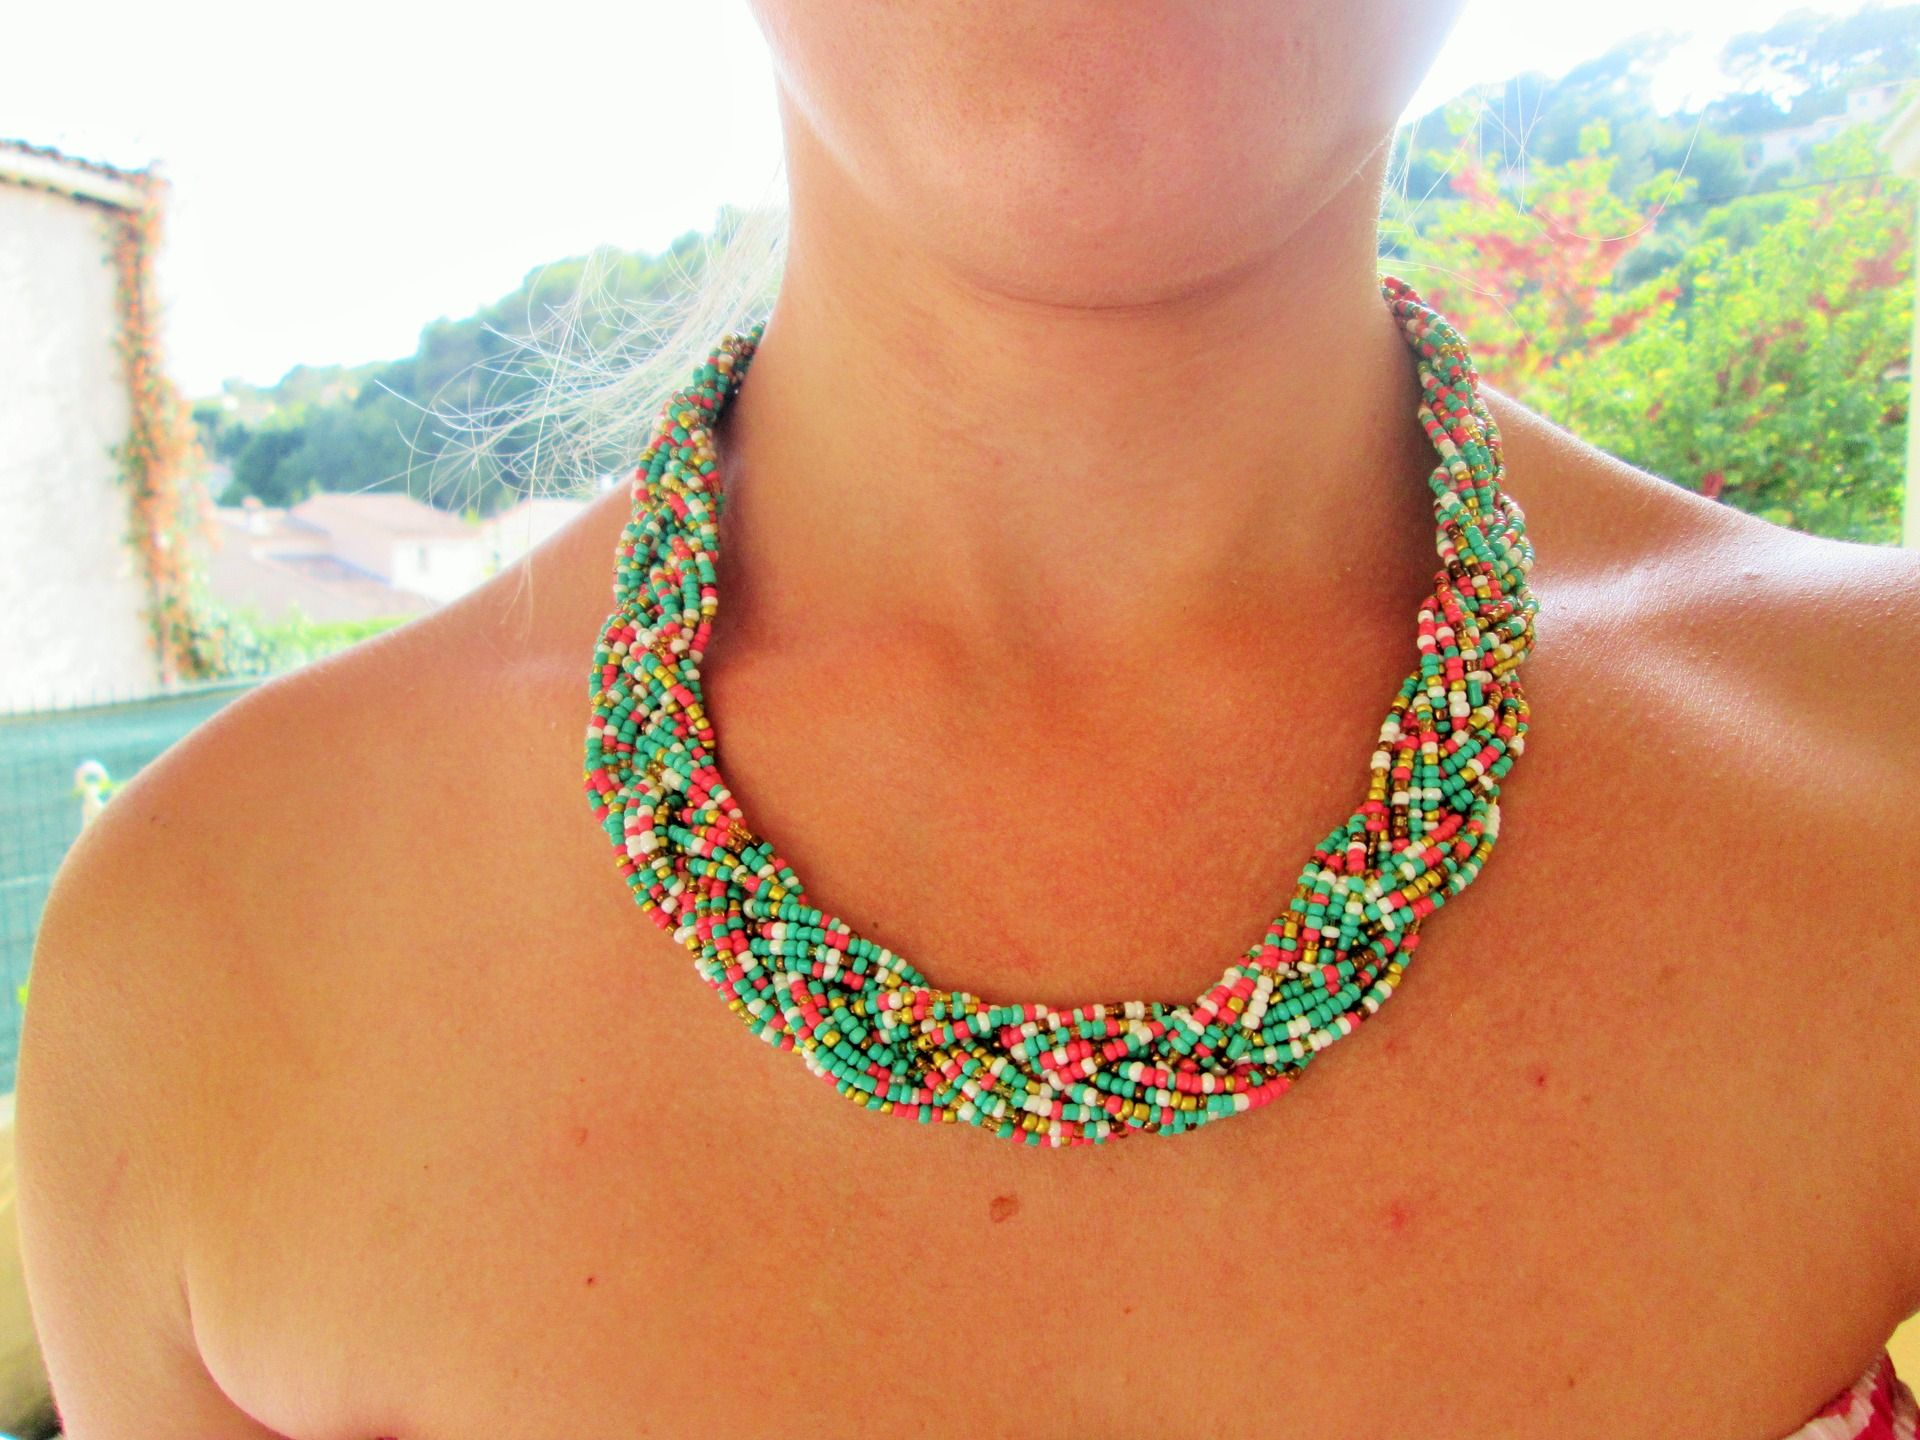 collier en perle de rocaille